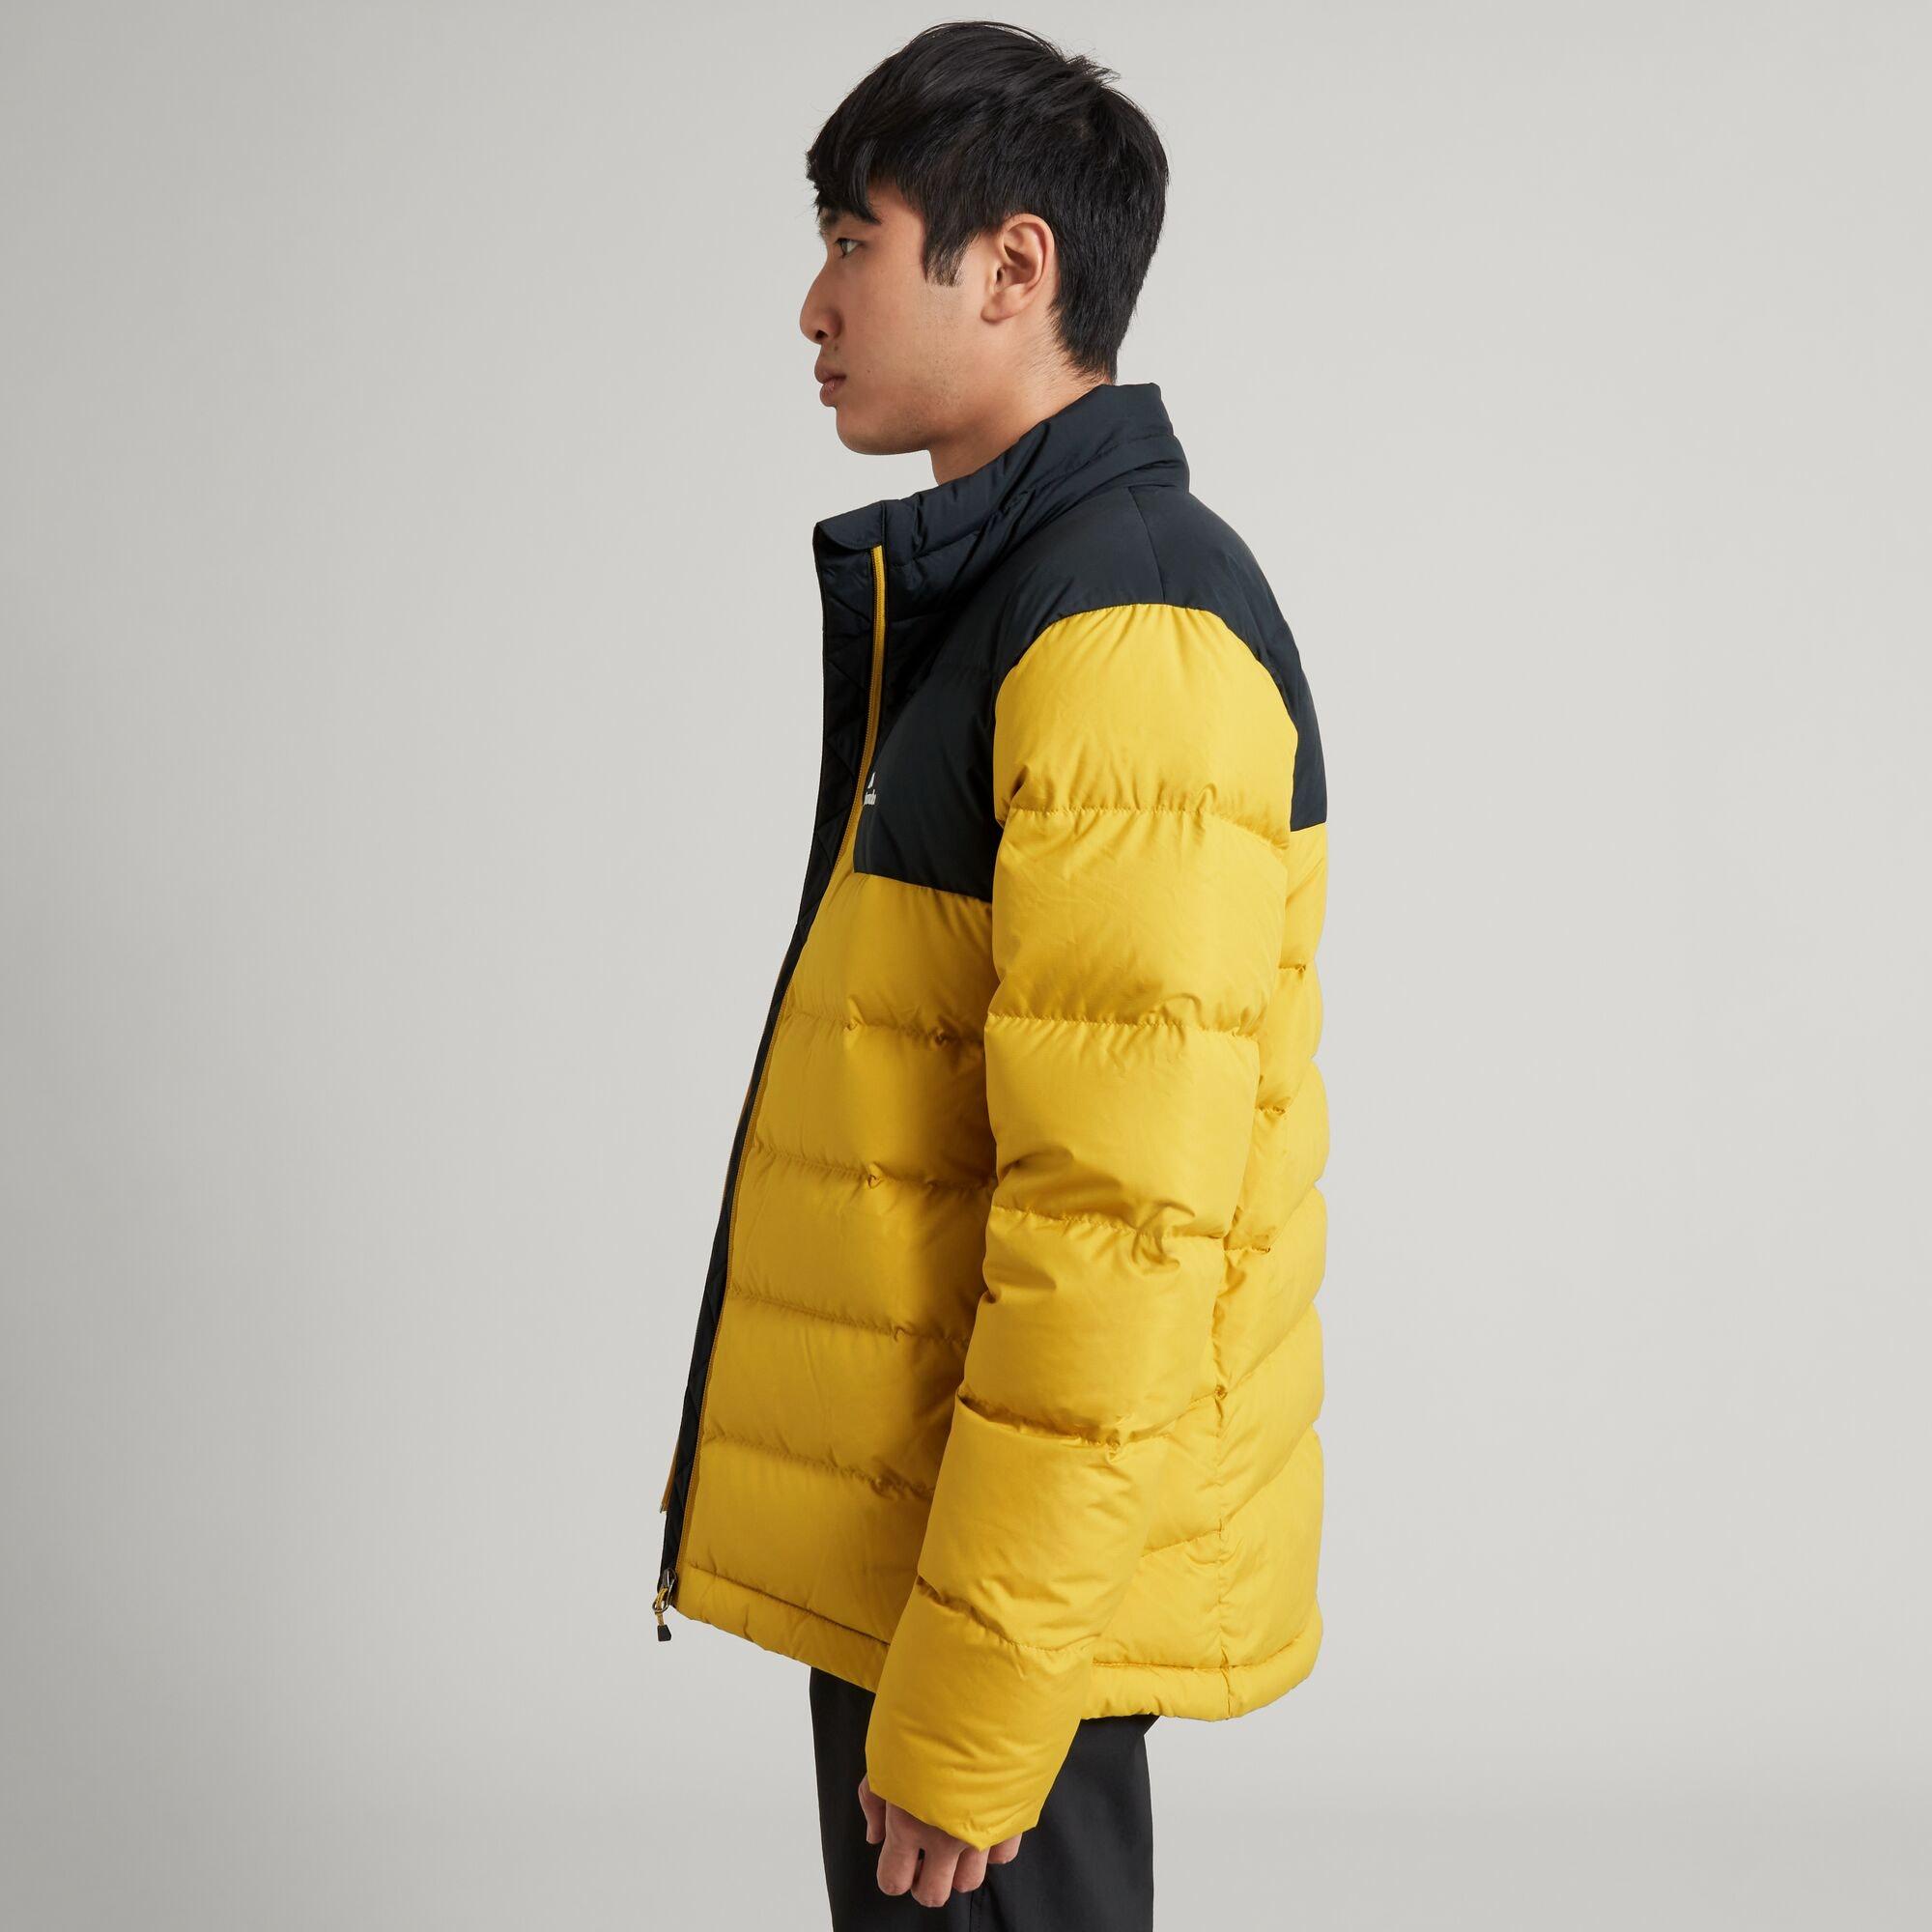 thumbnail 8 - NEW Kathmandu Epiq Mens 600 Fill Down Puffer Warm Outdoor Winter Jacket